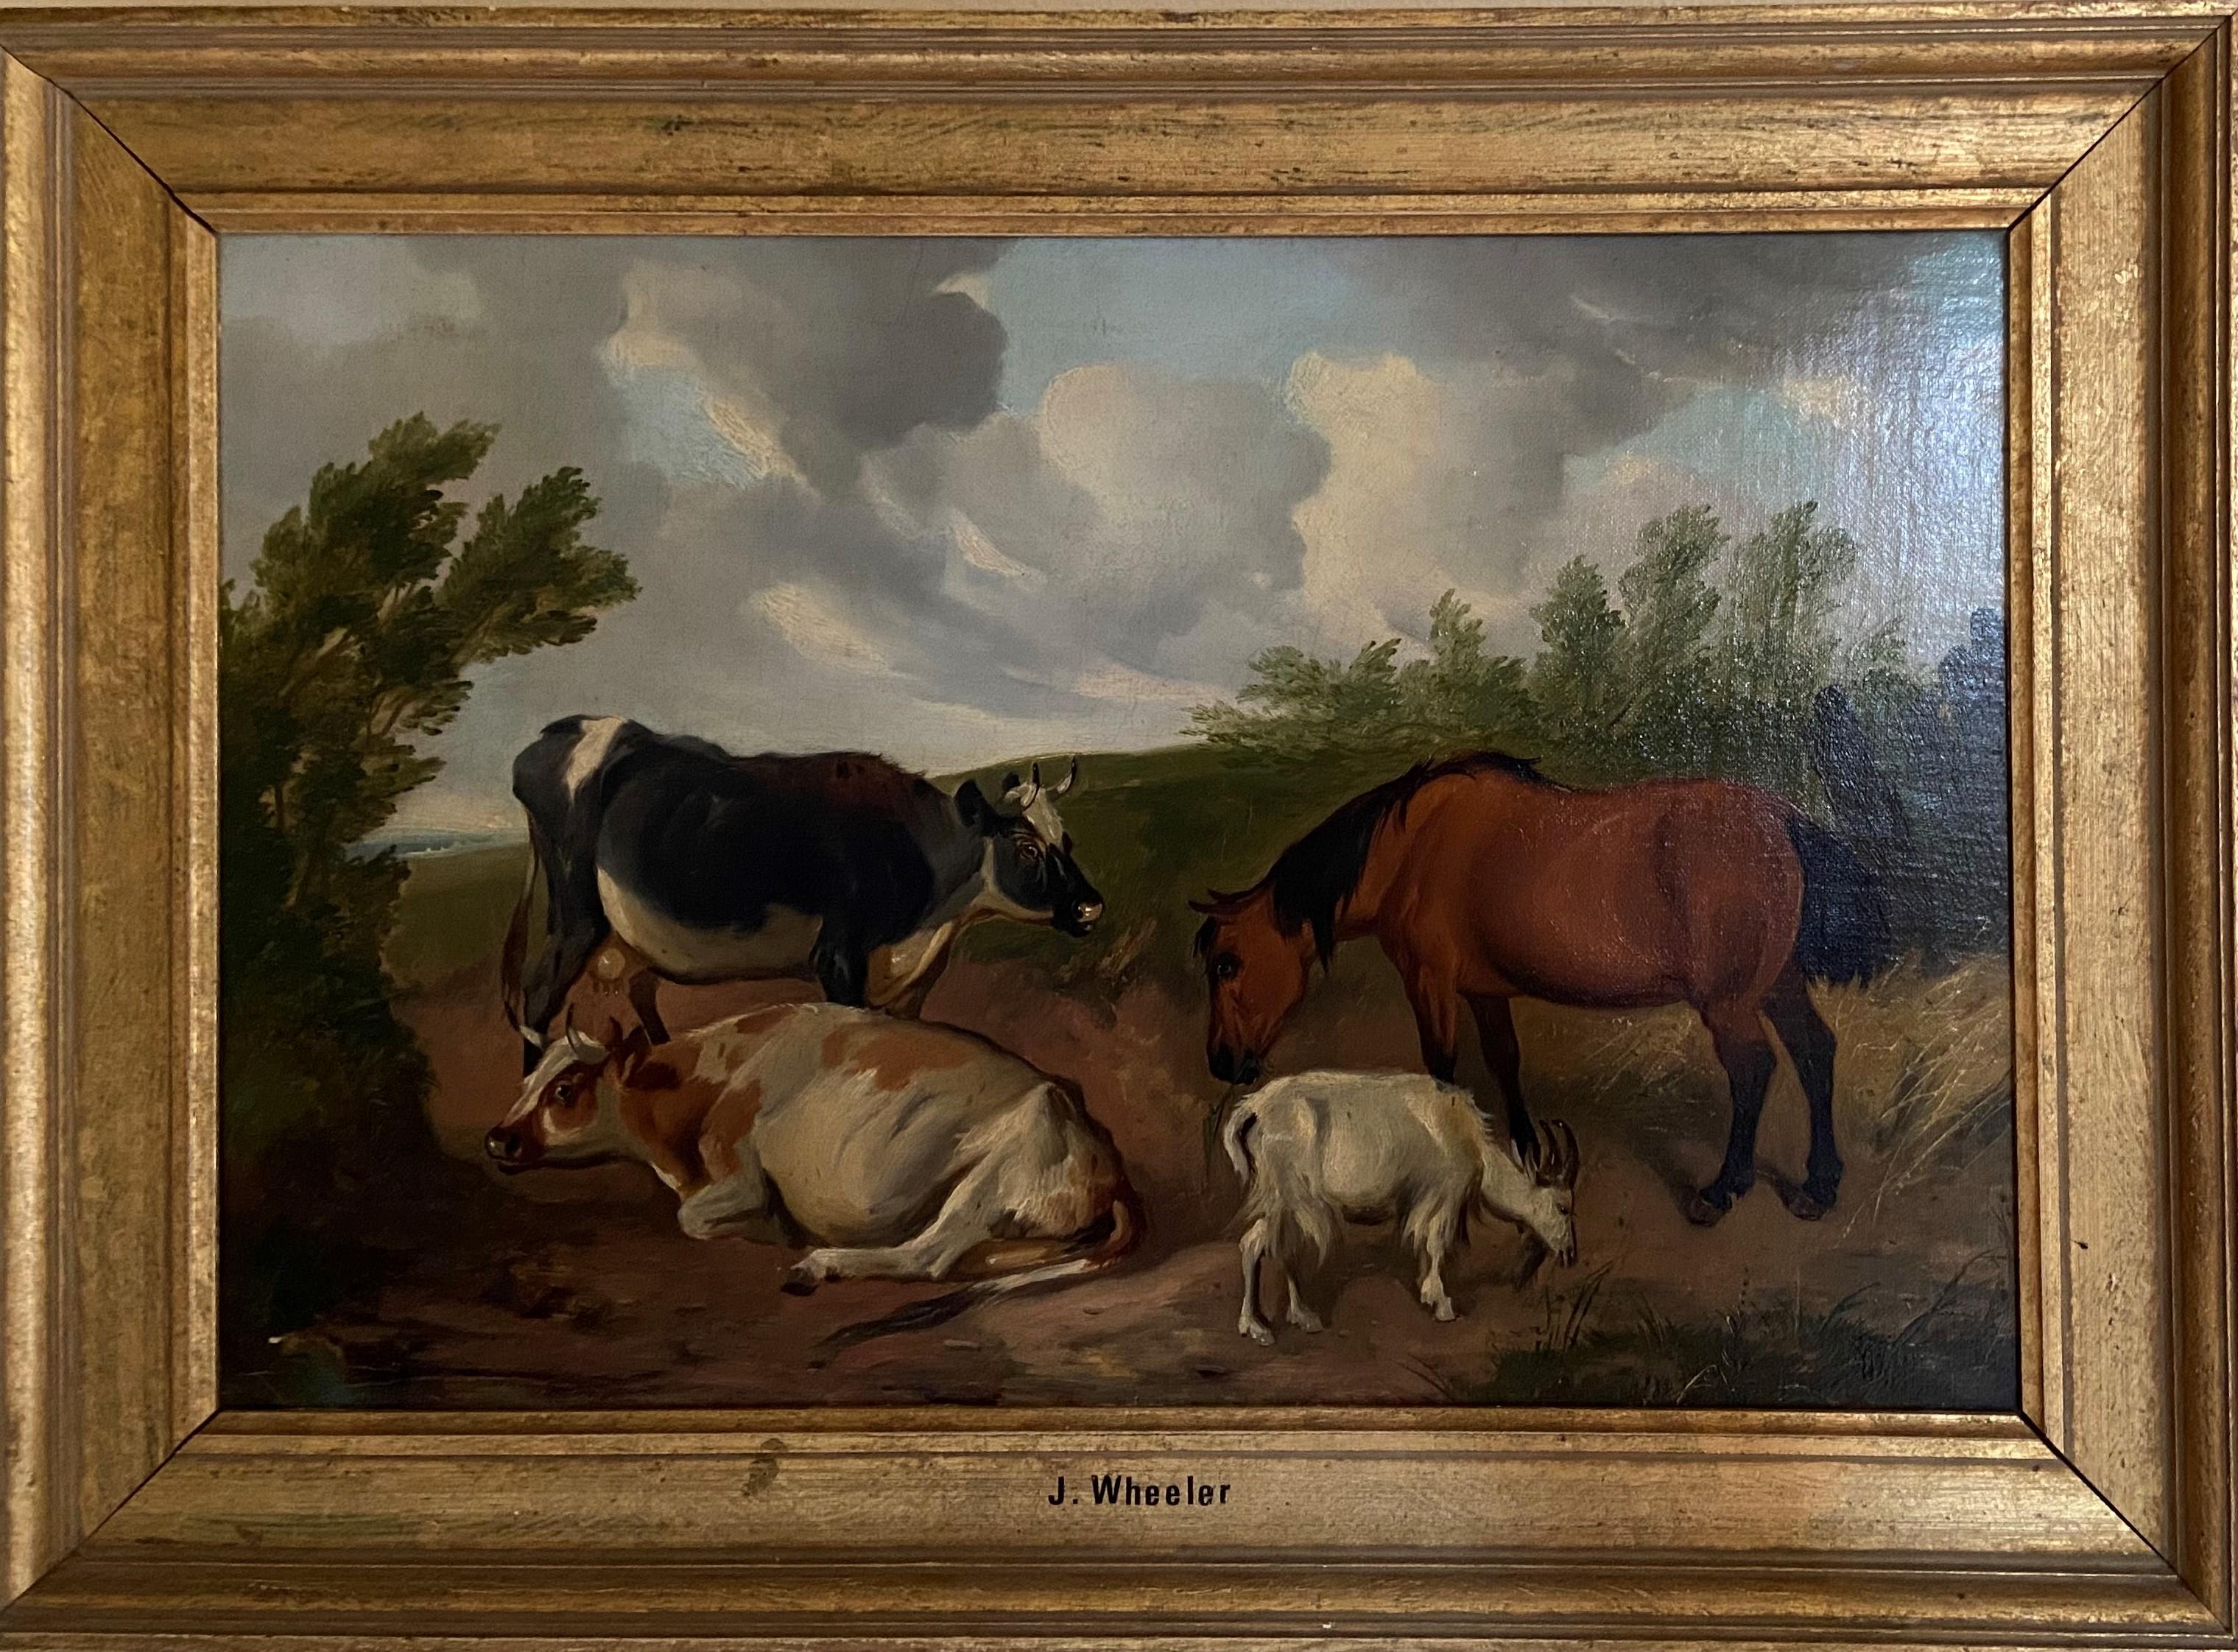 Circle of John Alfred Wheeler ''Cattle, Pony & Goat in a Landscape,'' O.O.C., bears monogram 12''